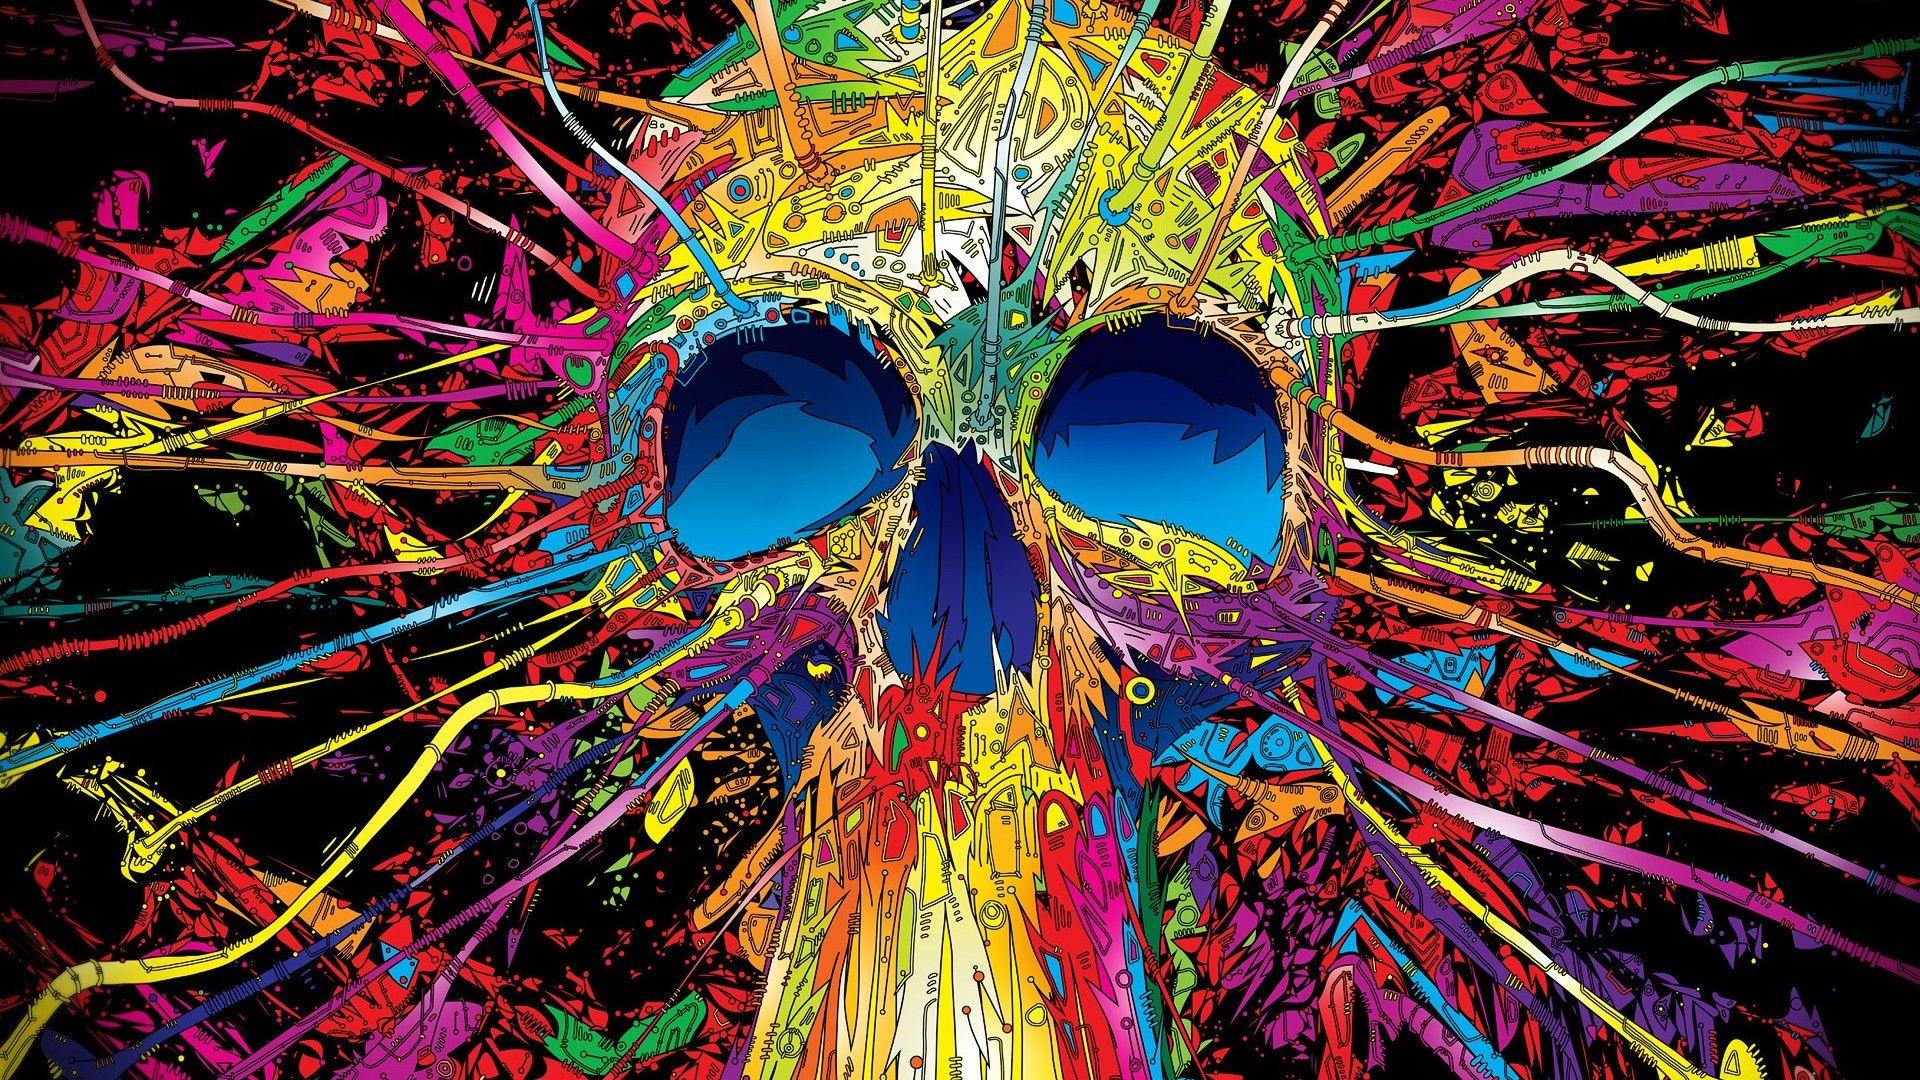 Trippy Desktop Backgrounds Hd Skull Wallpaper Skull Art Psychedelic Art